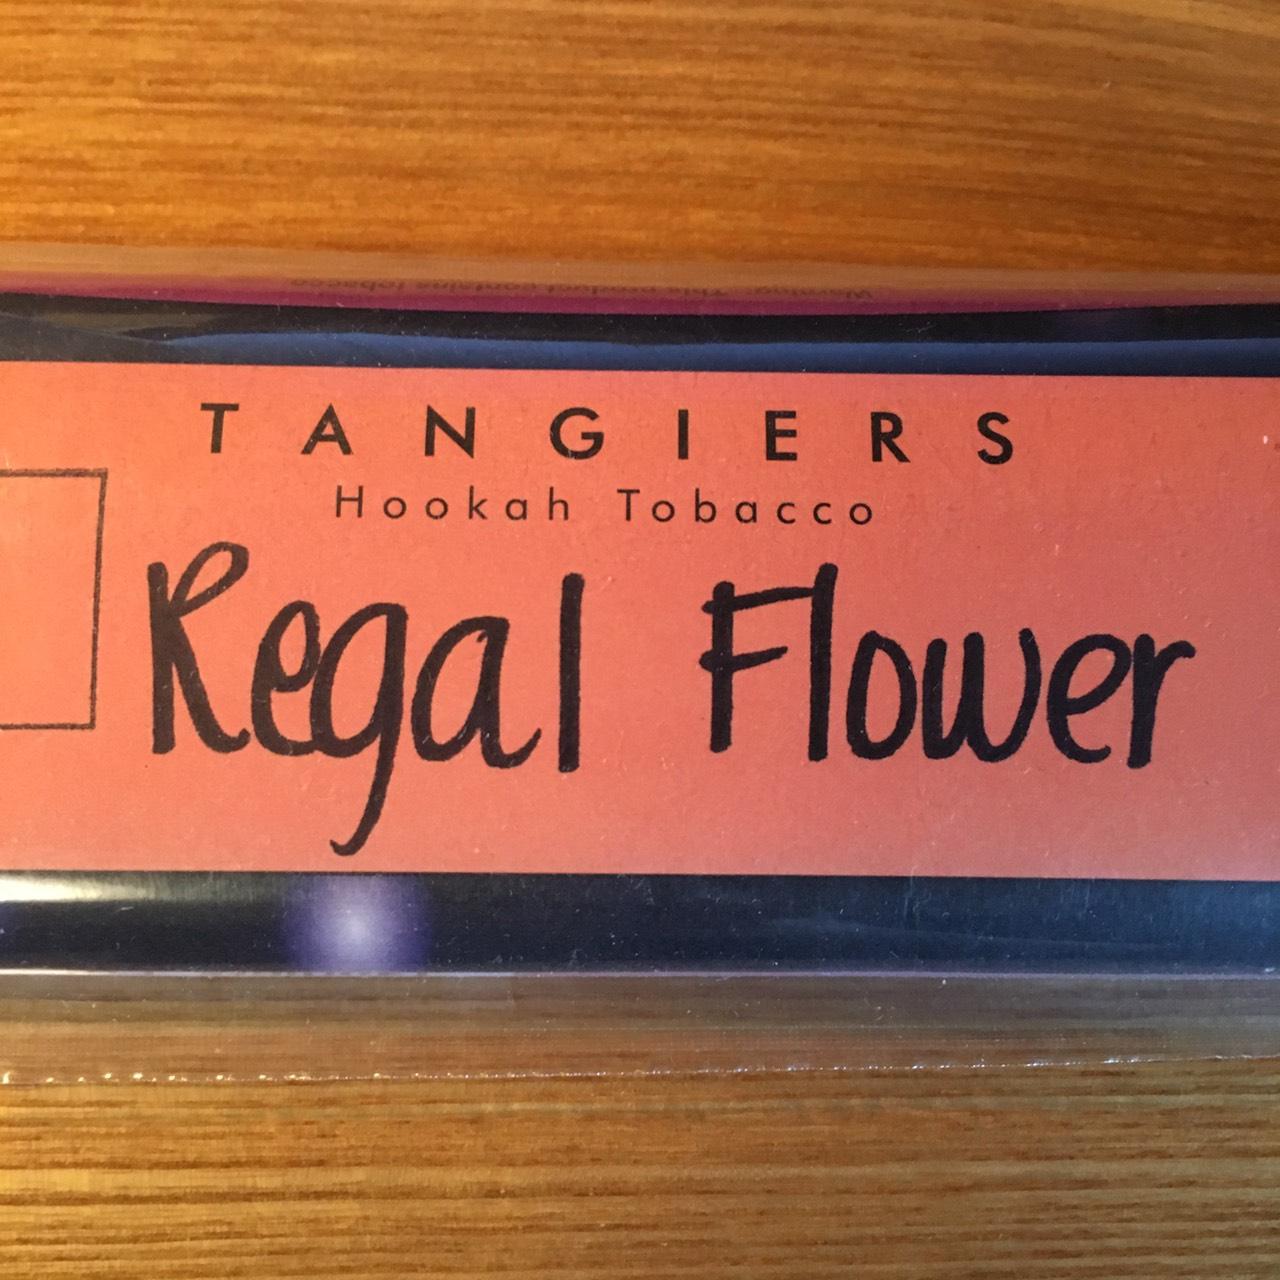 Tangiers Noir / Regal Flower(生のレモングラス入りのジャスミンティのような香り)